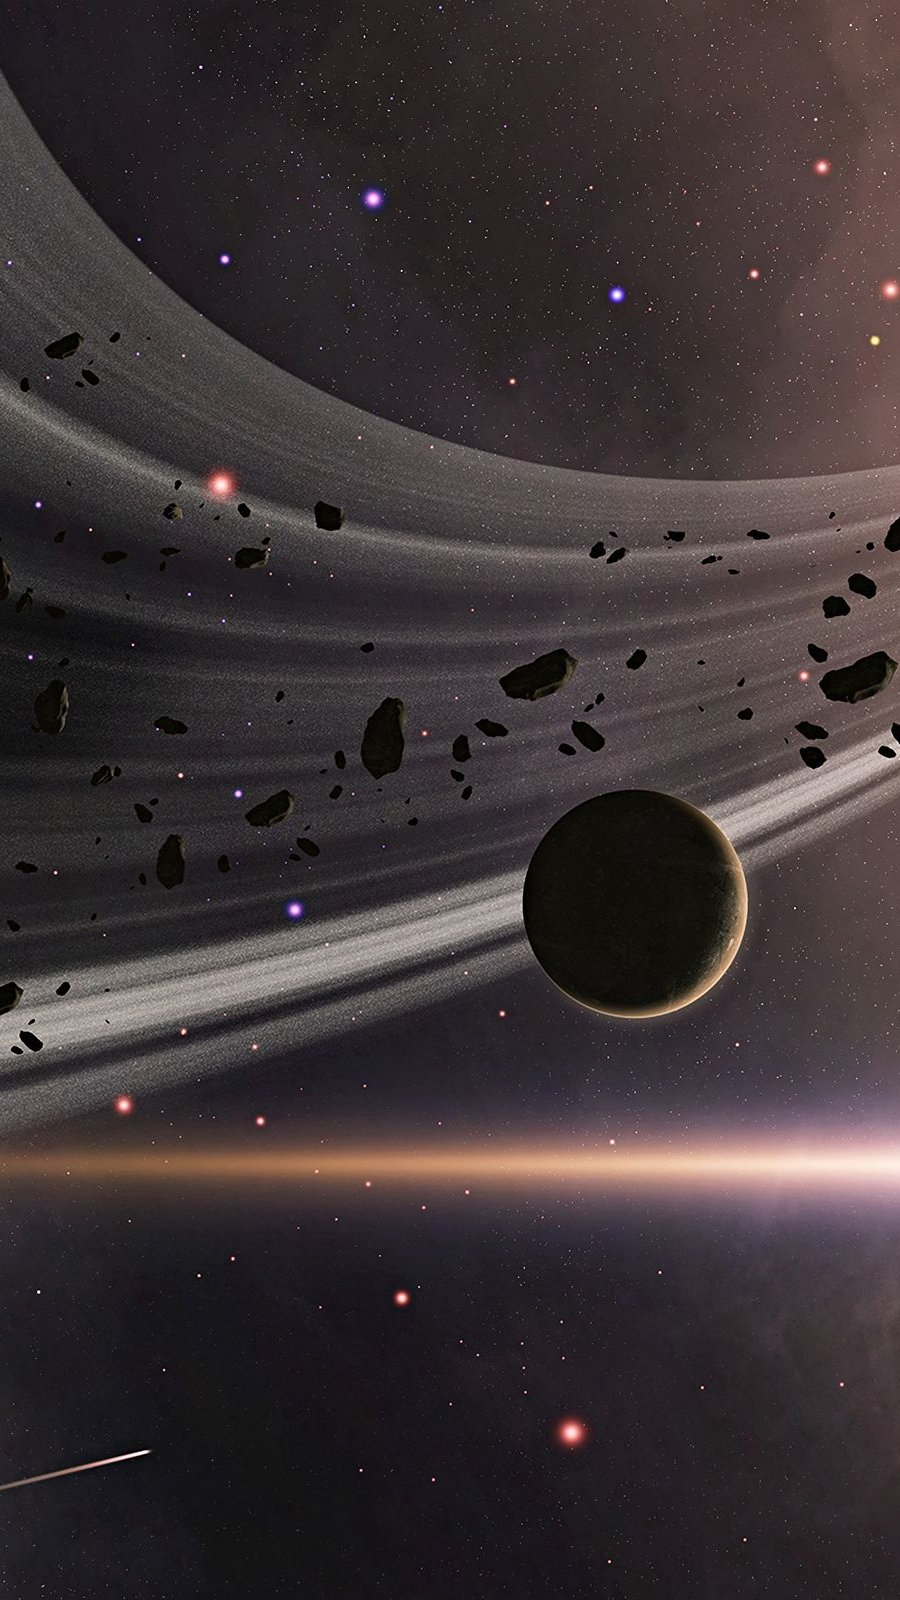 Fondos de pantalla Anillo de asteroides en el espacio Vertical